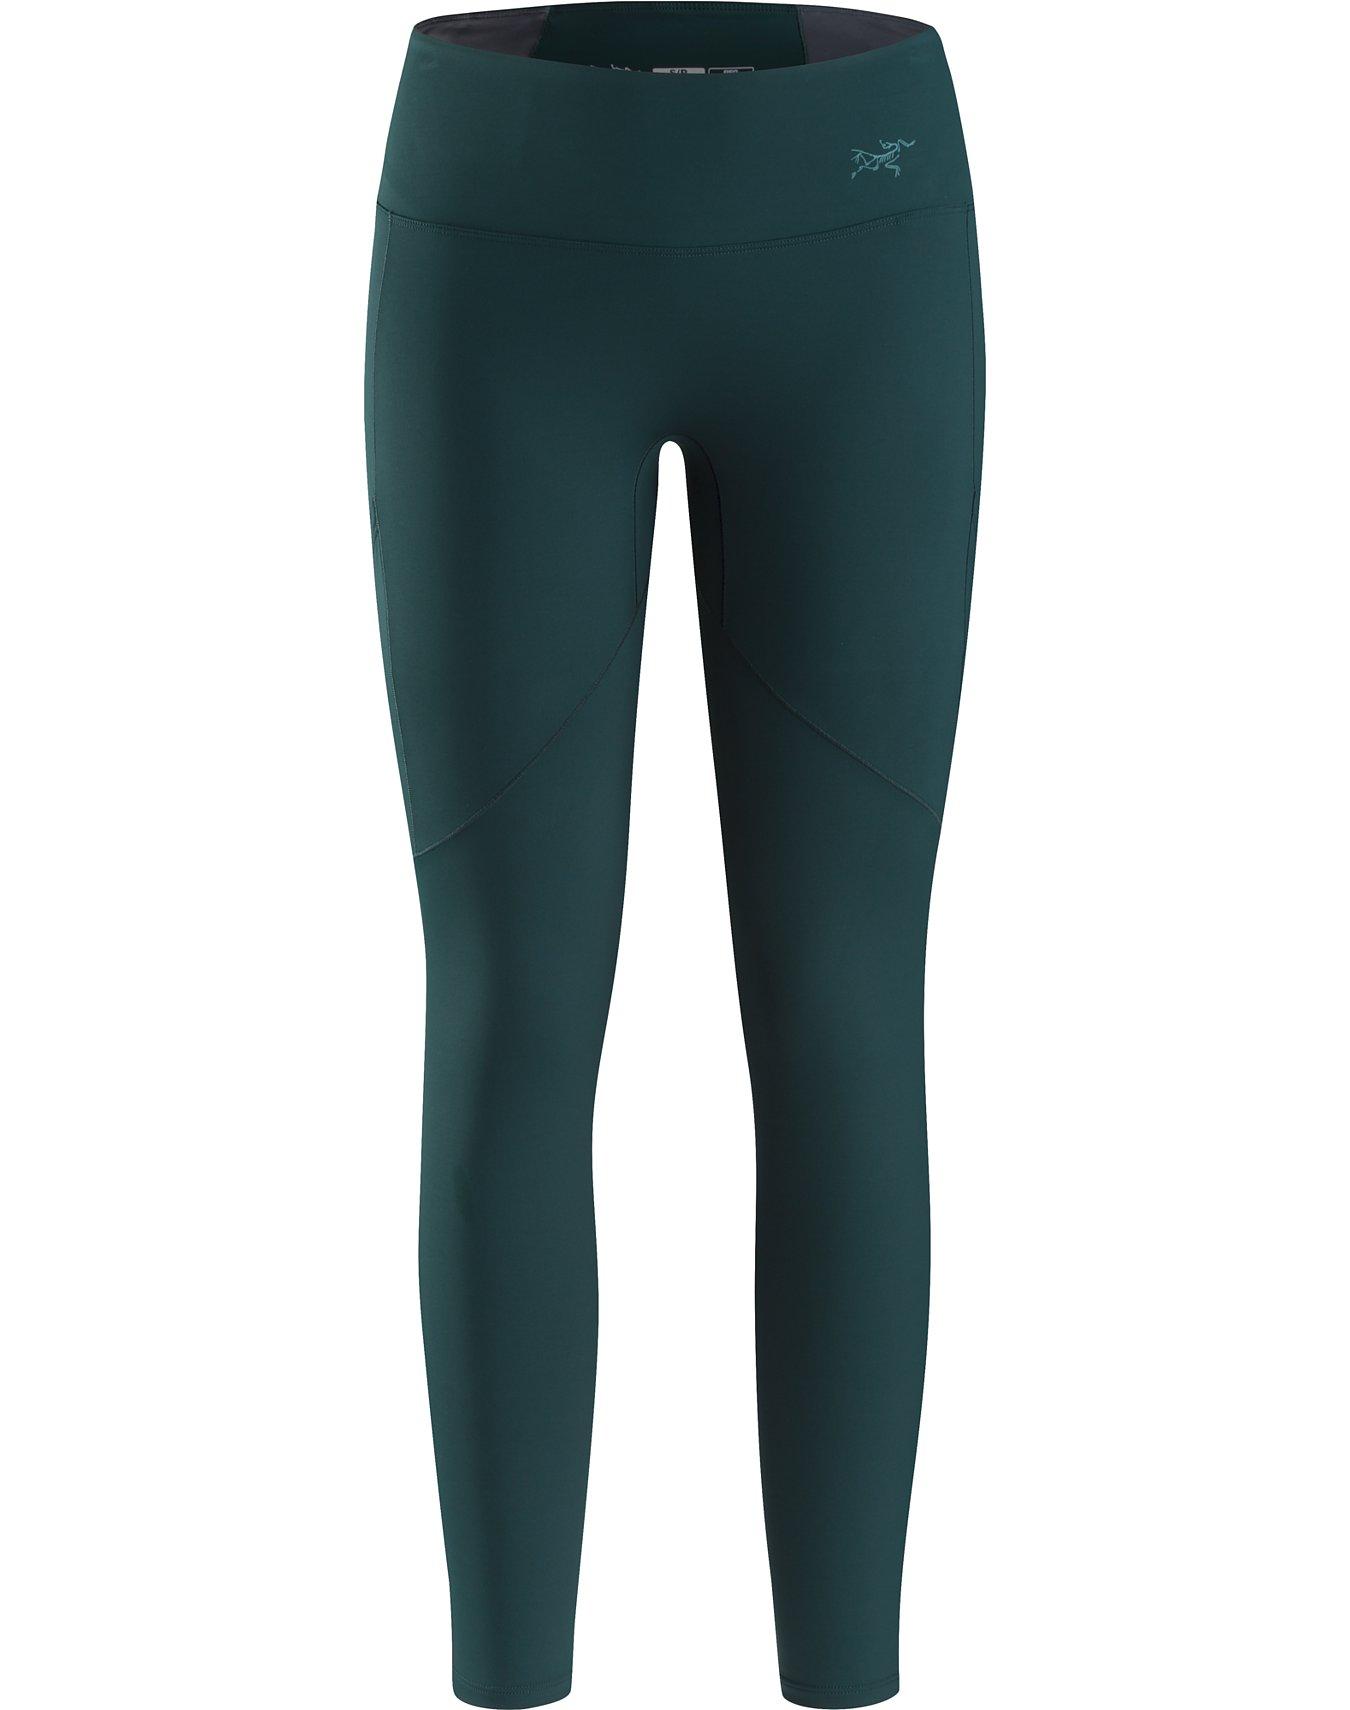 Nike Sportswear Leg A See Damen Leggings mit hohem Bund (große Größe)